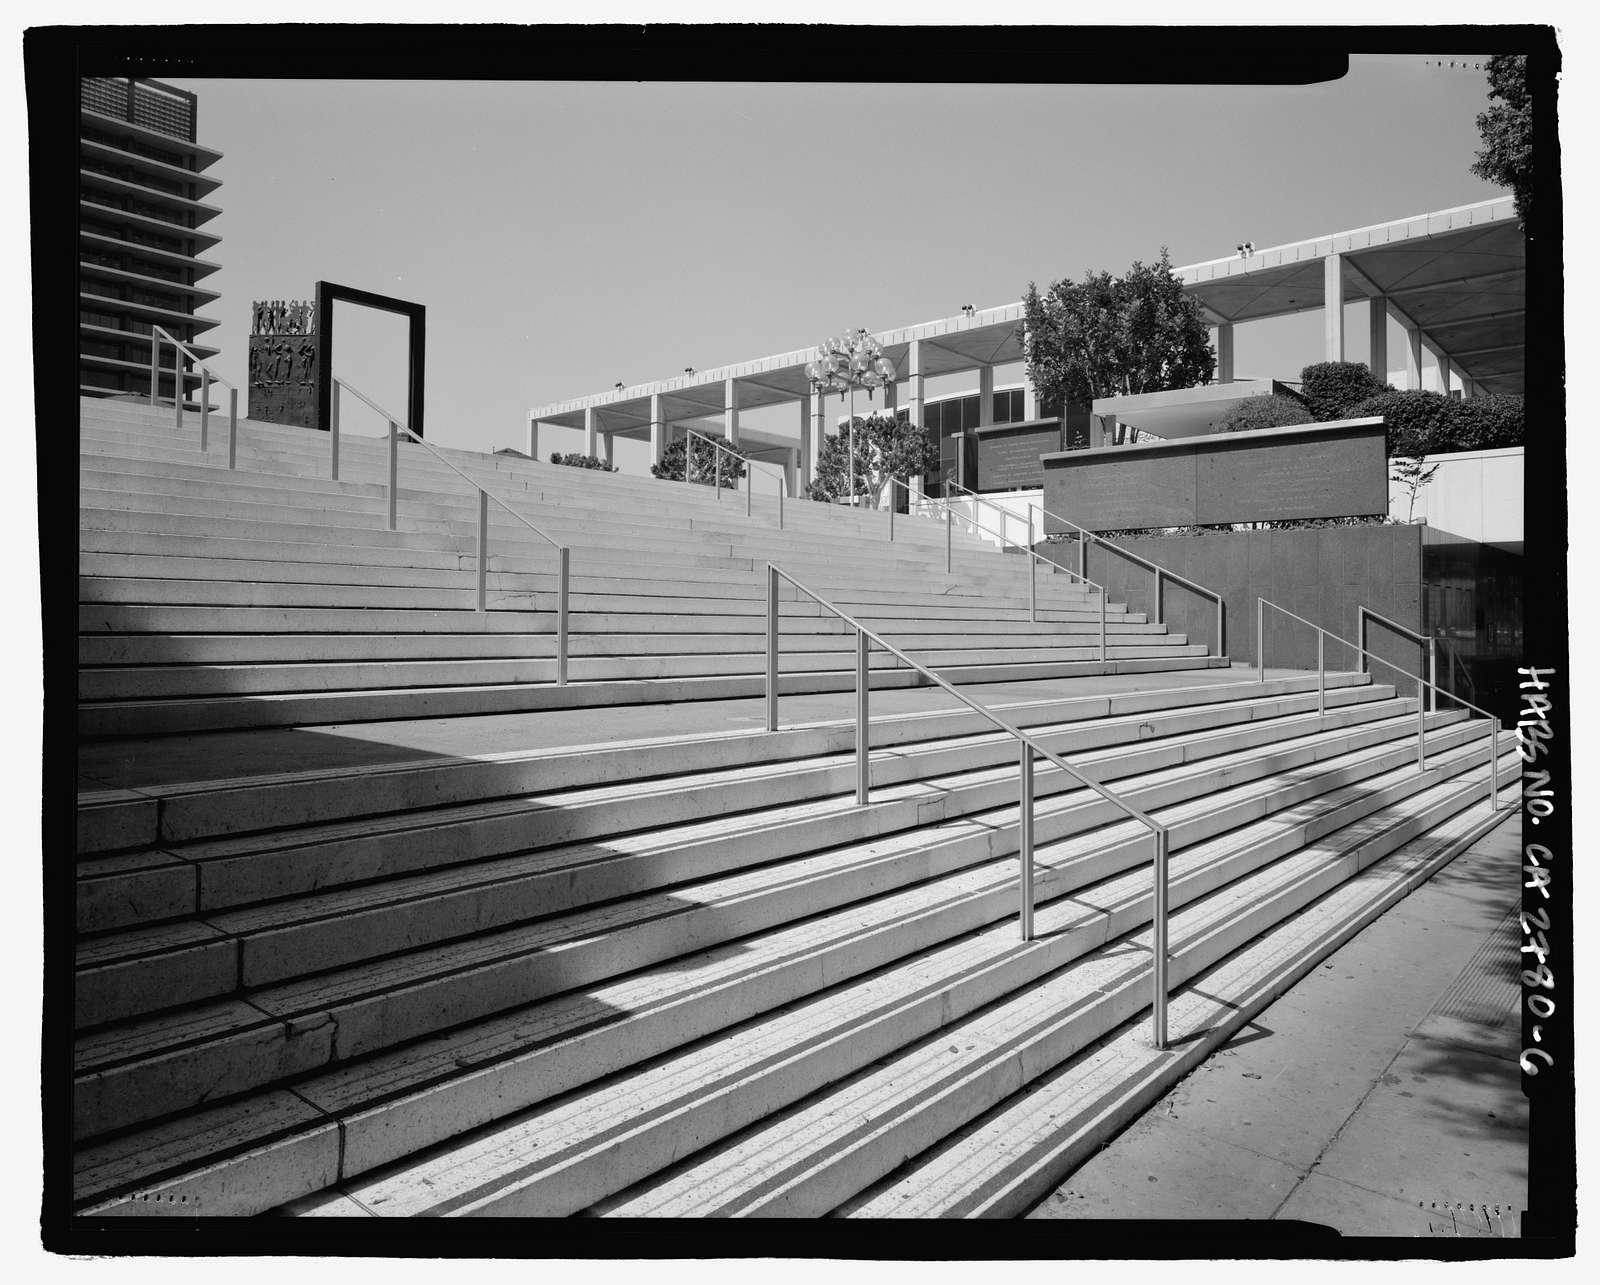 Los Angeles Music Center, 135 North Grand Avenue, Los Angeles, Los Angeles County, CA